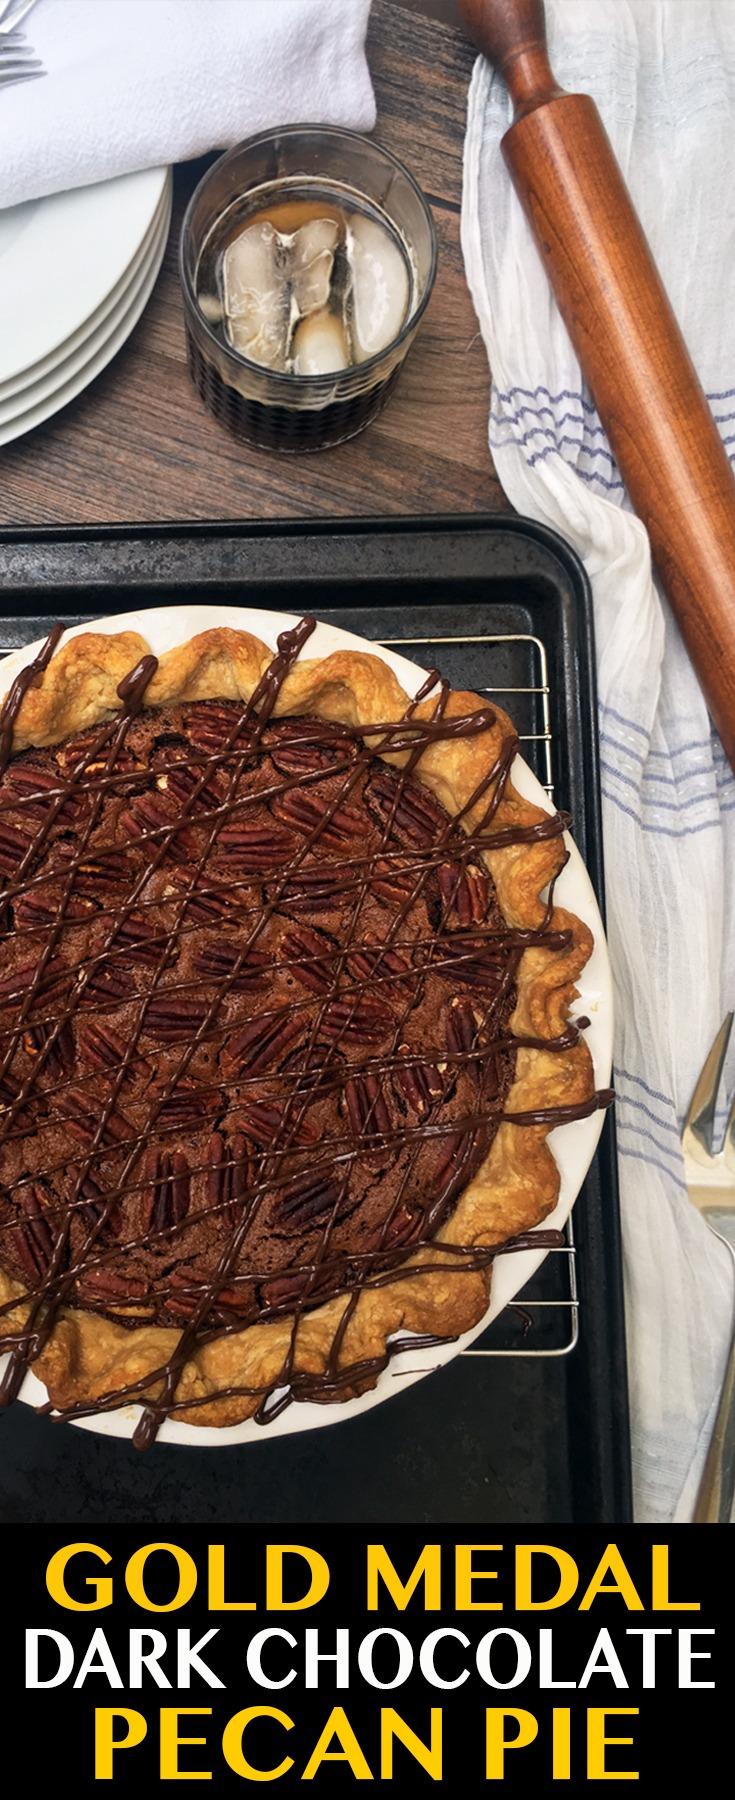 Gold Medal Dark Chocolate Pecan Pie!